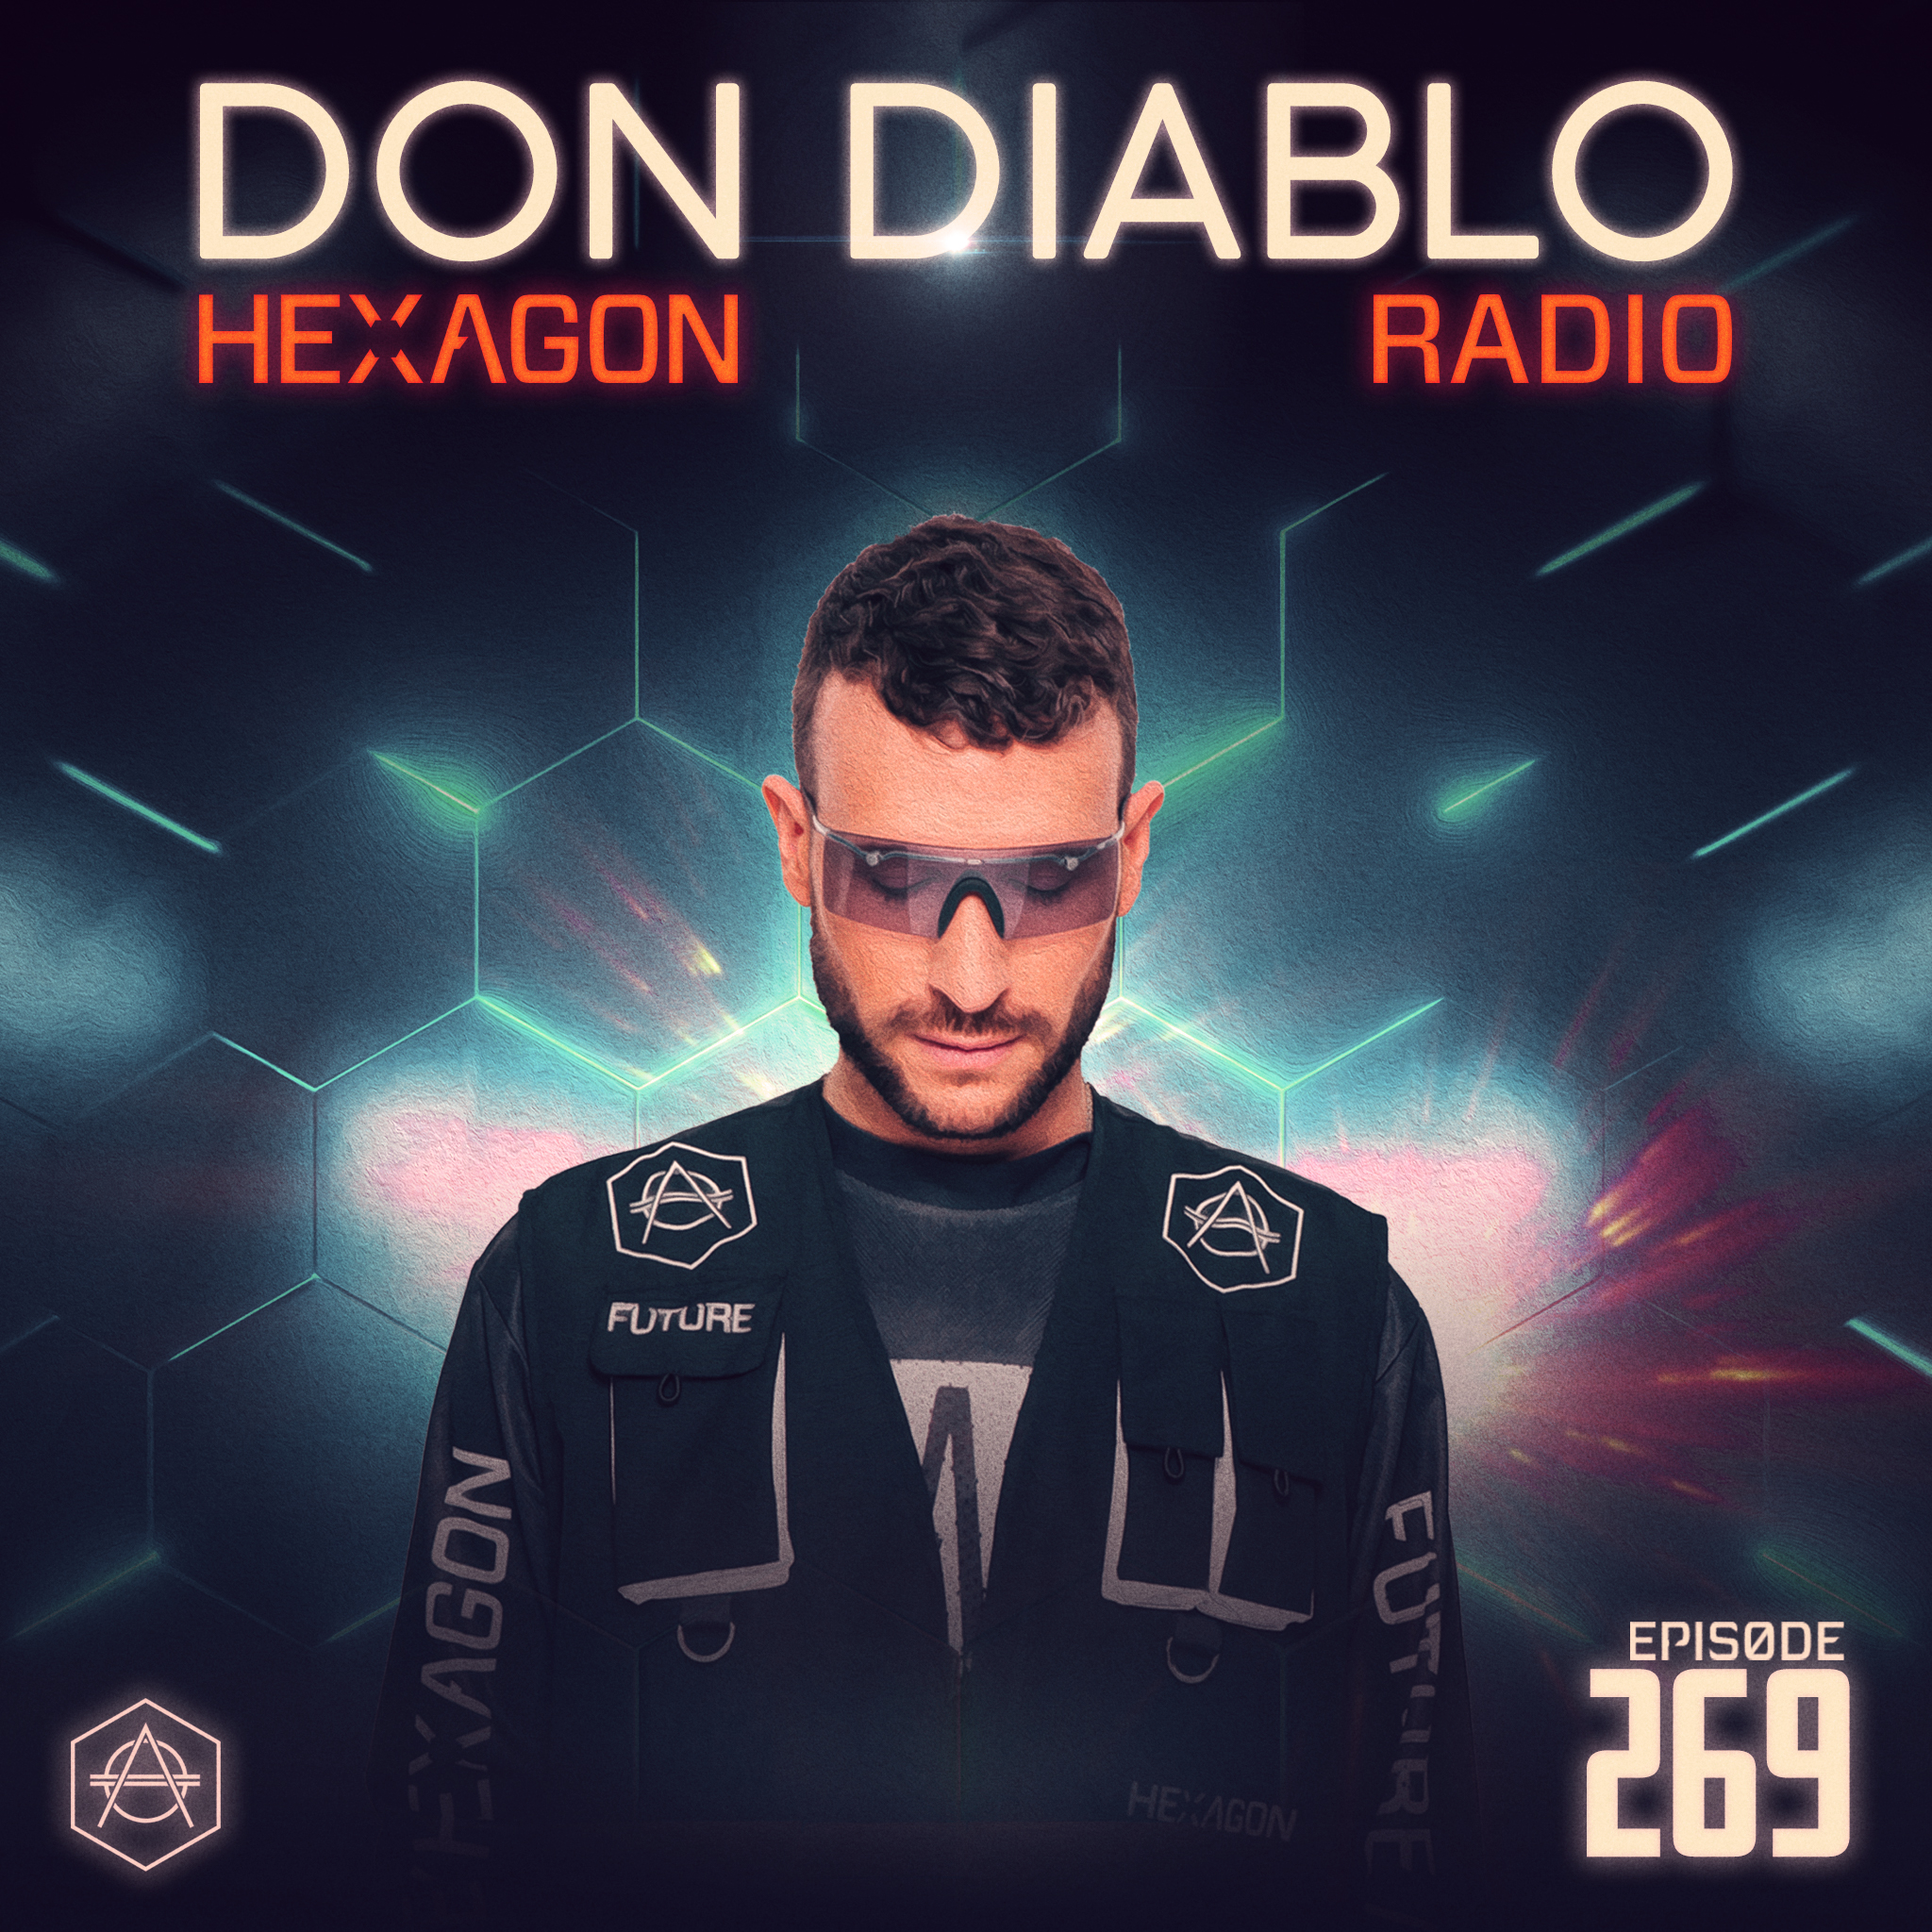 Don Diablo Hexagon Radio Episode 269